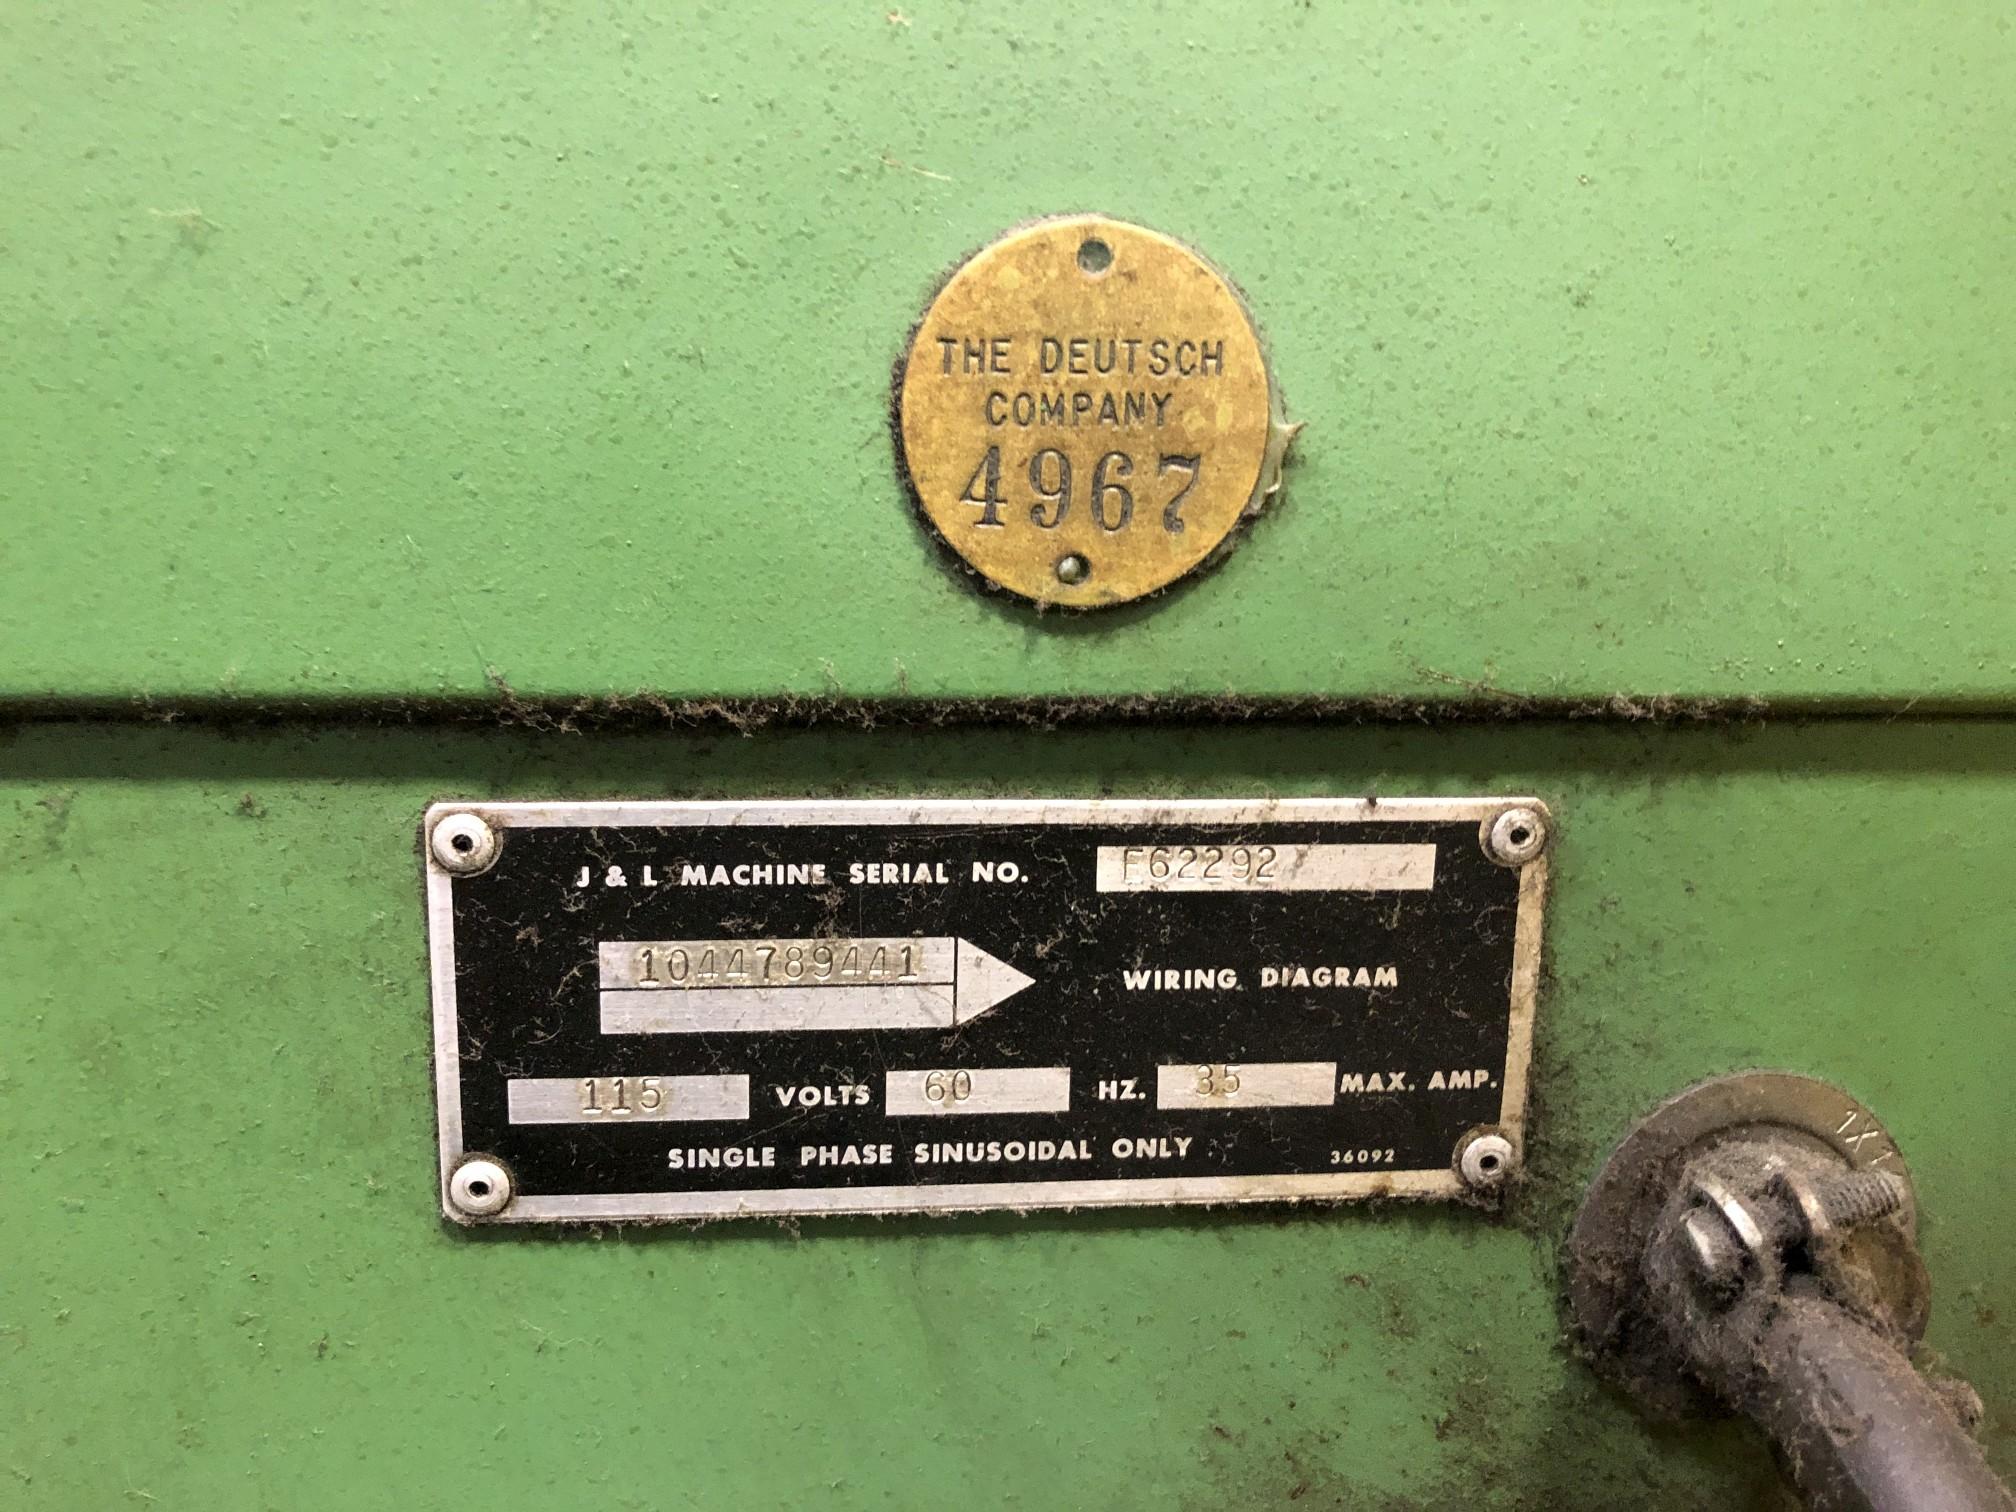 "Jones & Lamson 14"" Optical Comparator - Image 4 of 5"